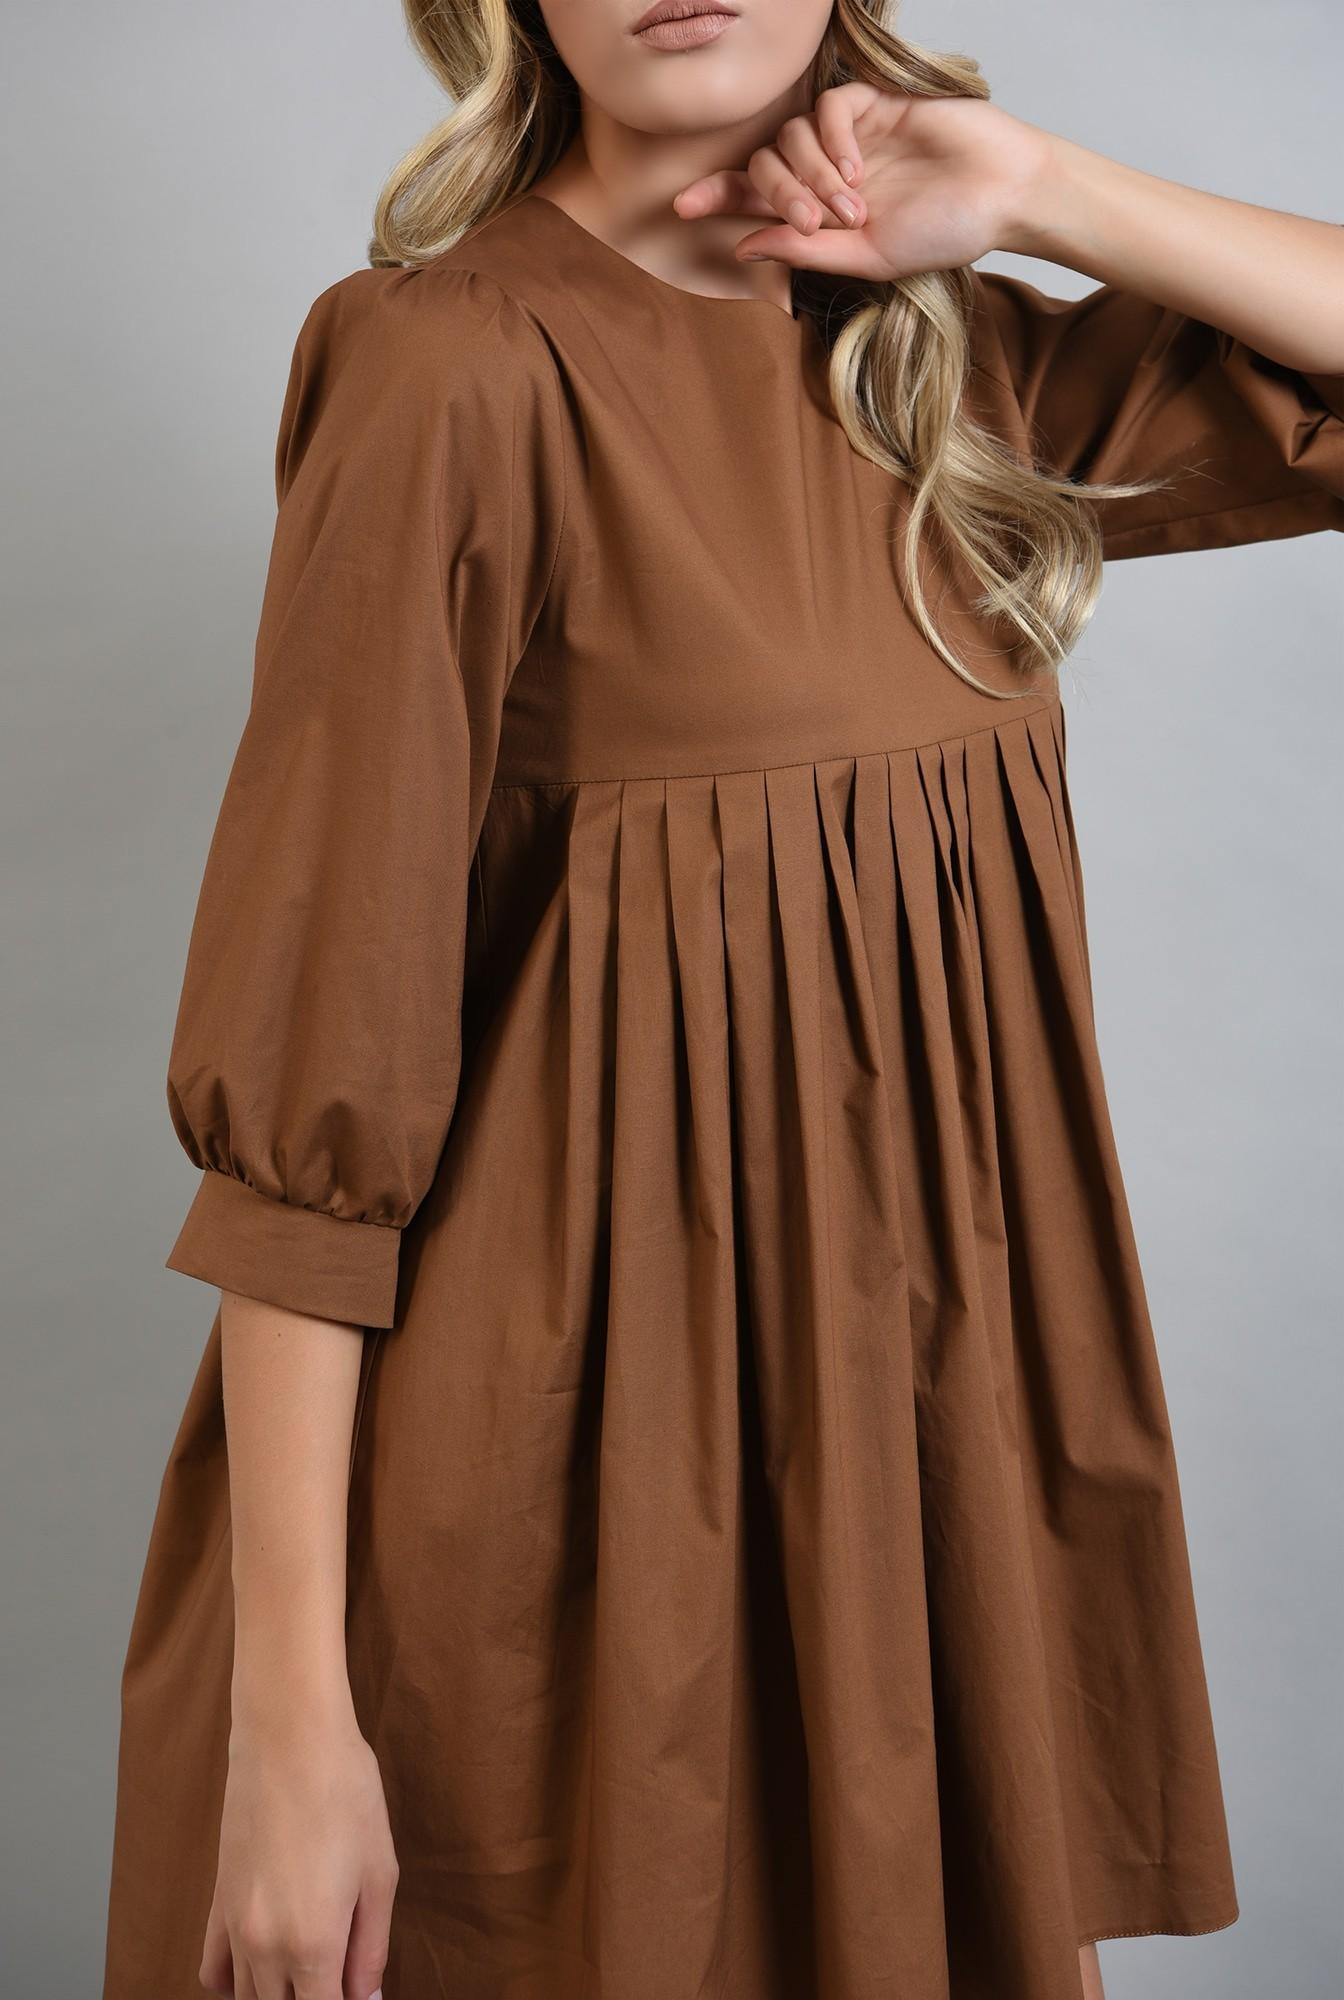 2 - rochie maro, din bumbac, cu pliuri, Poema